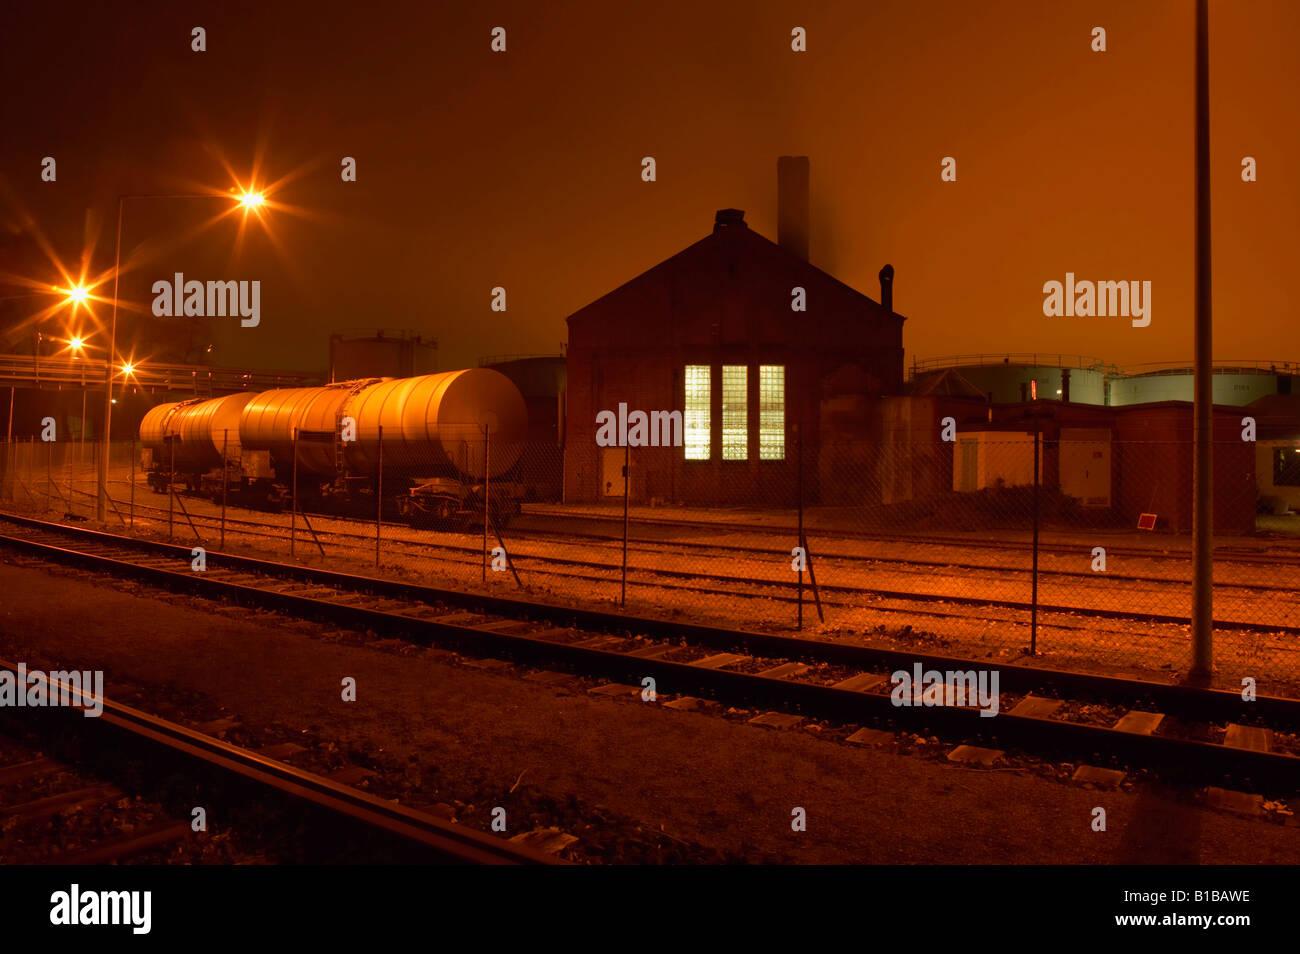 Germany, Hamburg, Petroleum harbour at night - Stock Image